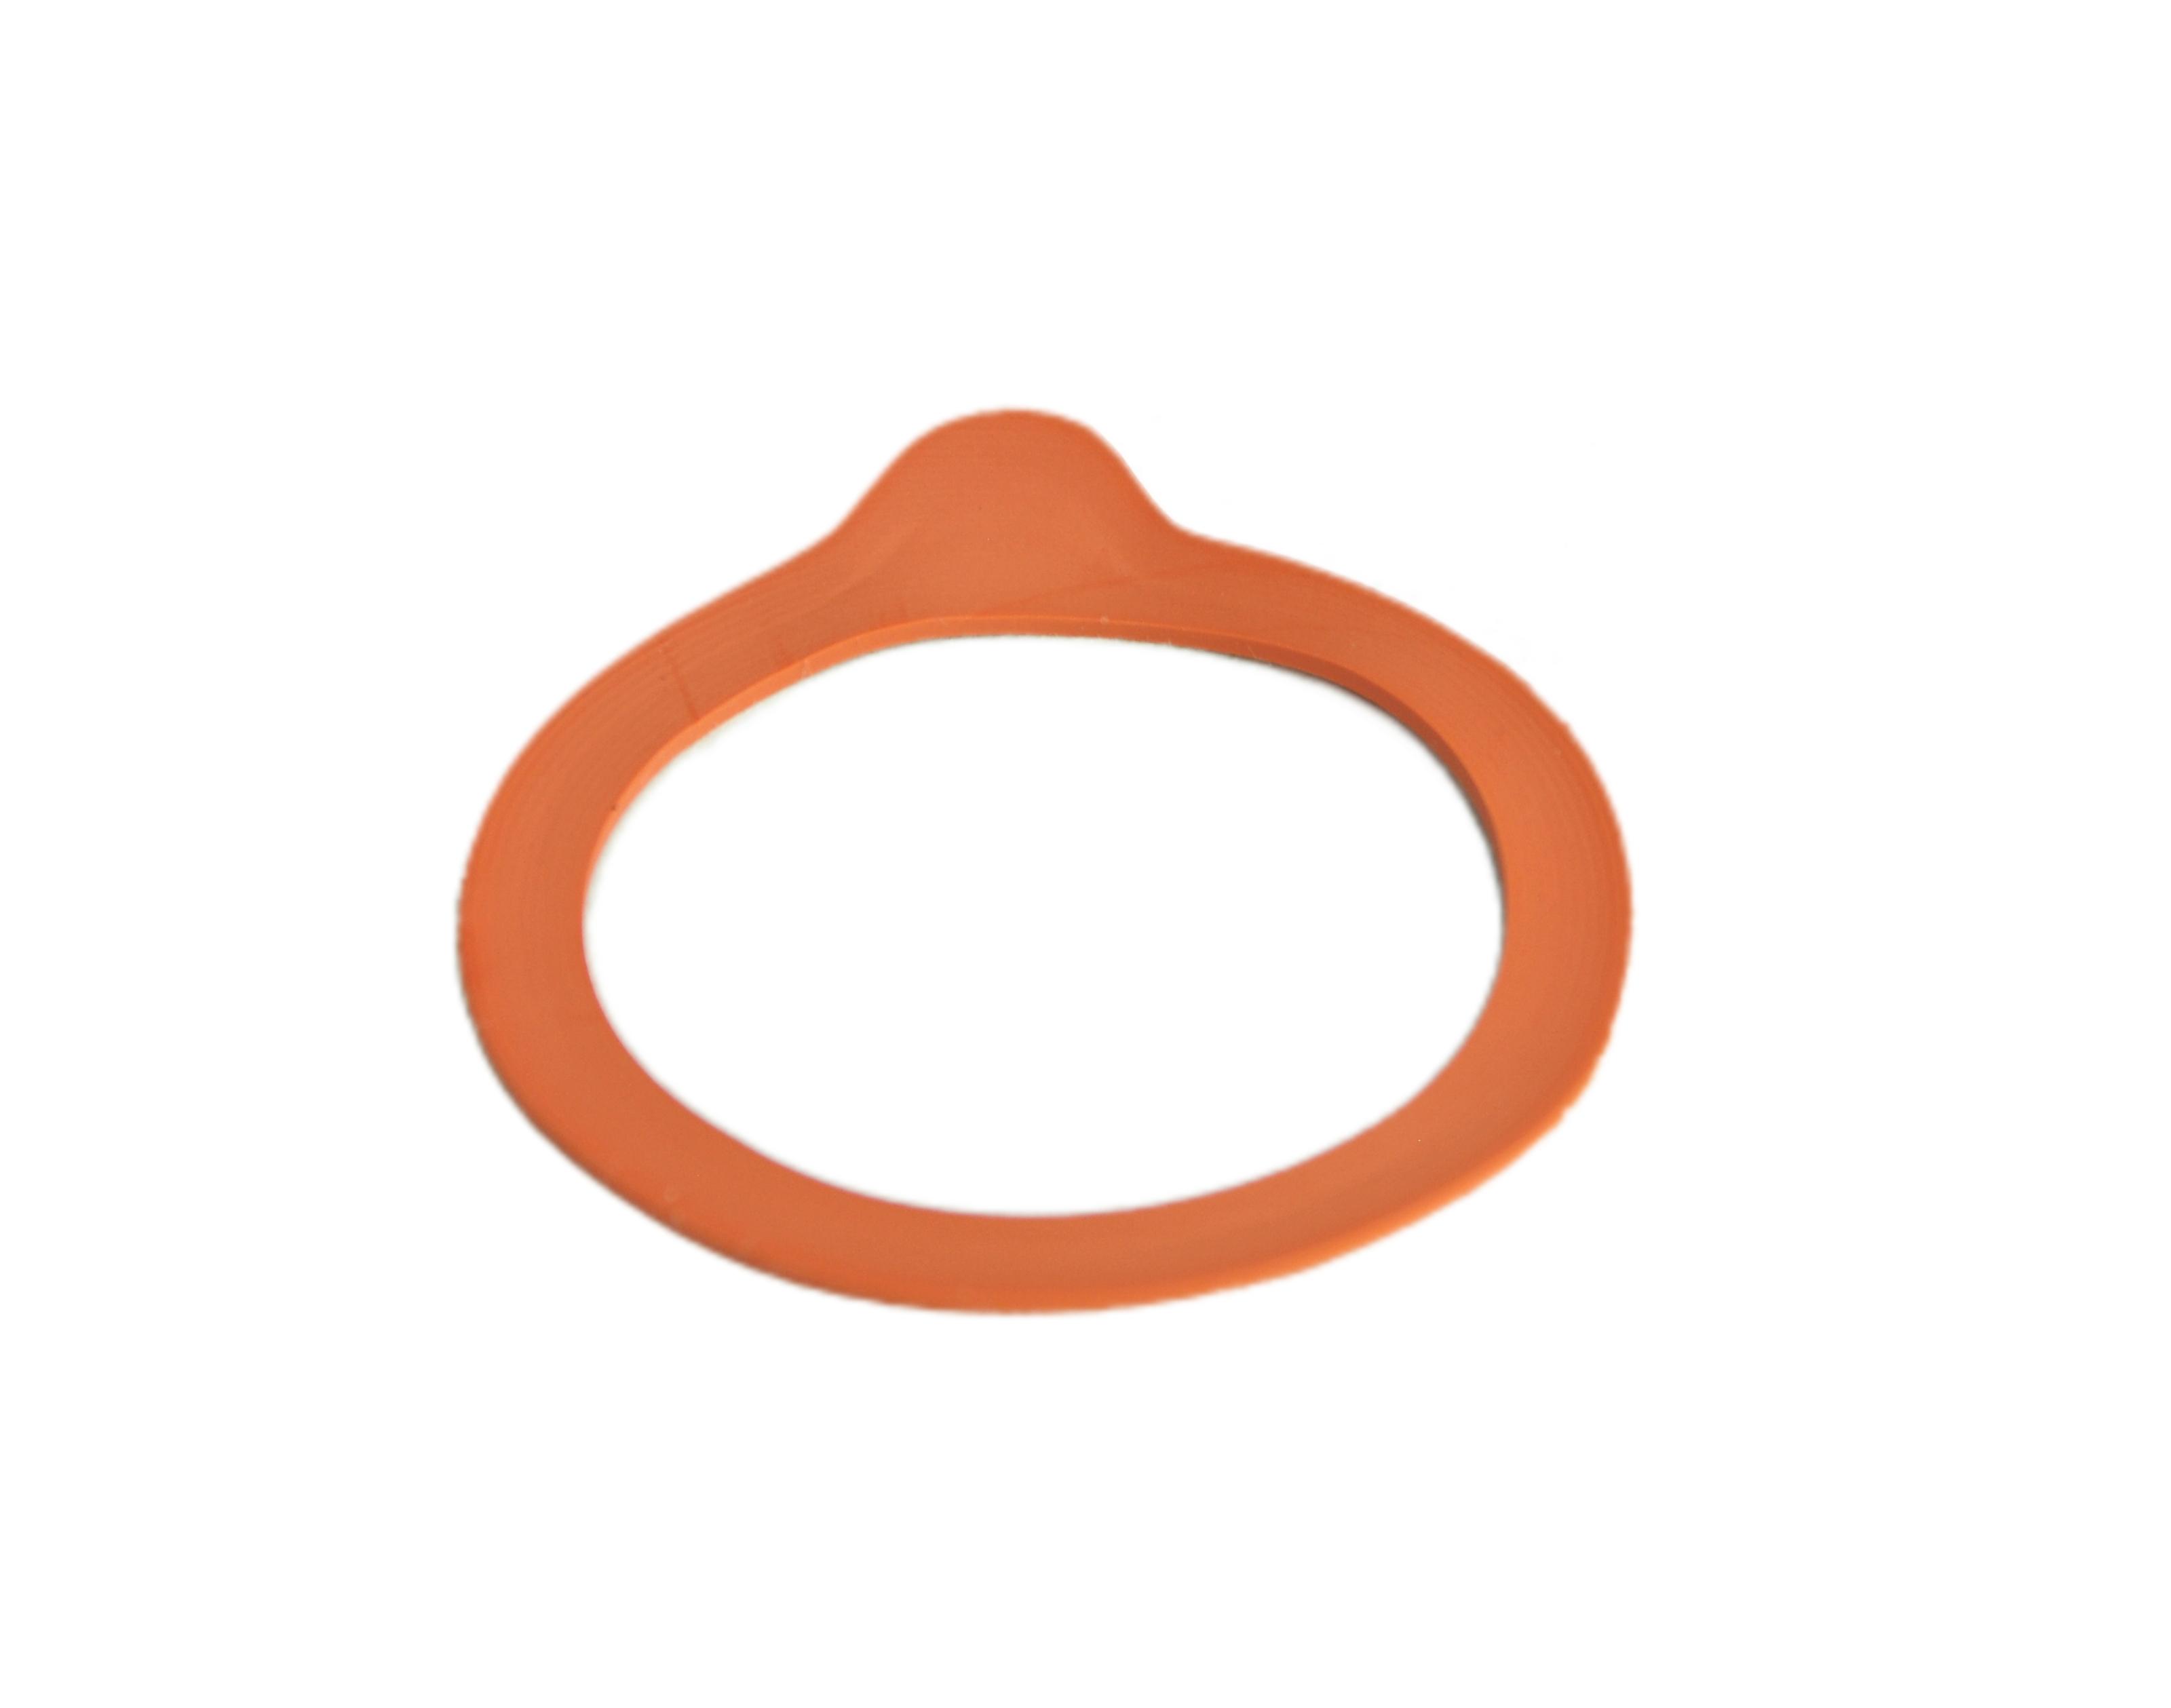 10 weck einkochringe 60mm rundrandglas rr60 gummiringe einmachring ring gummi ebay. Black Bedroom Furniture Sets. Home Design Ideas